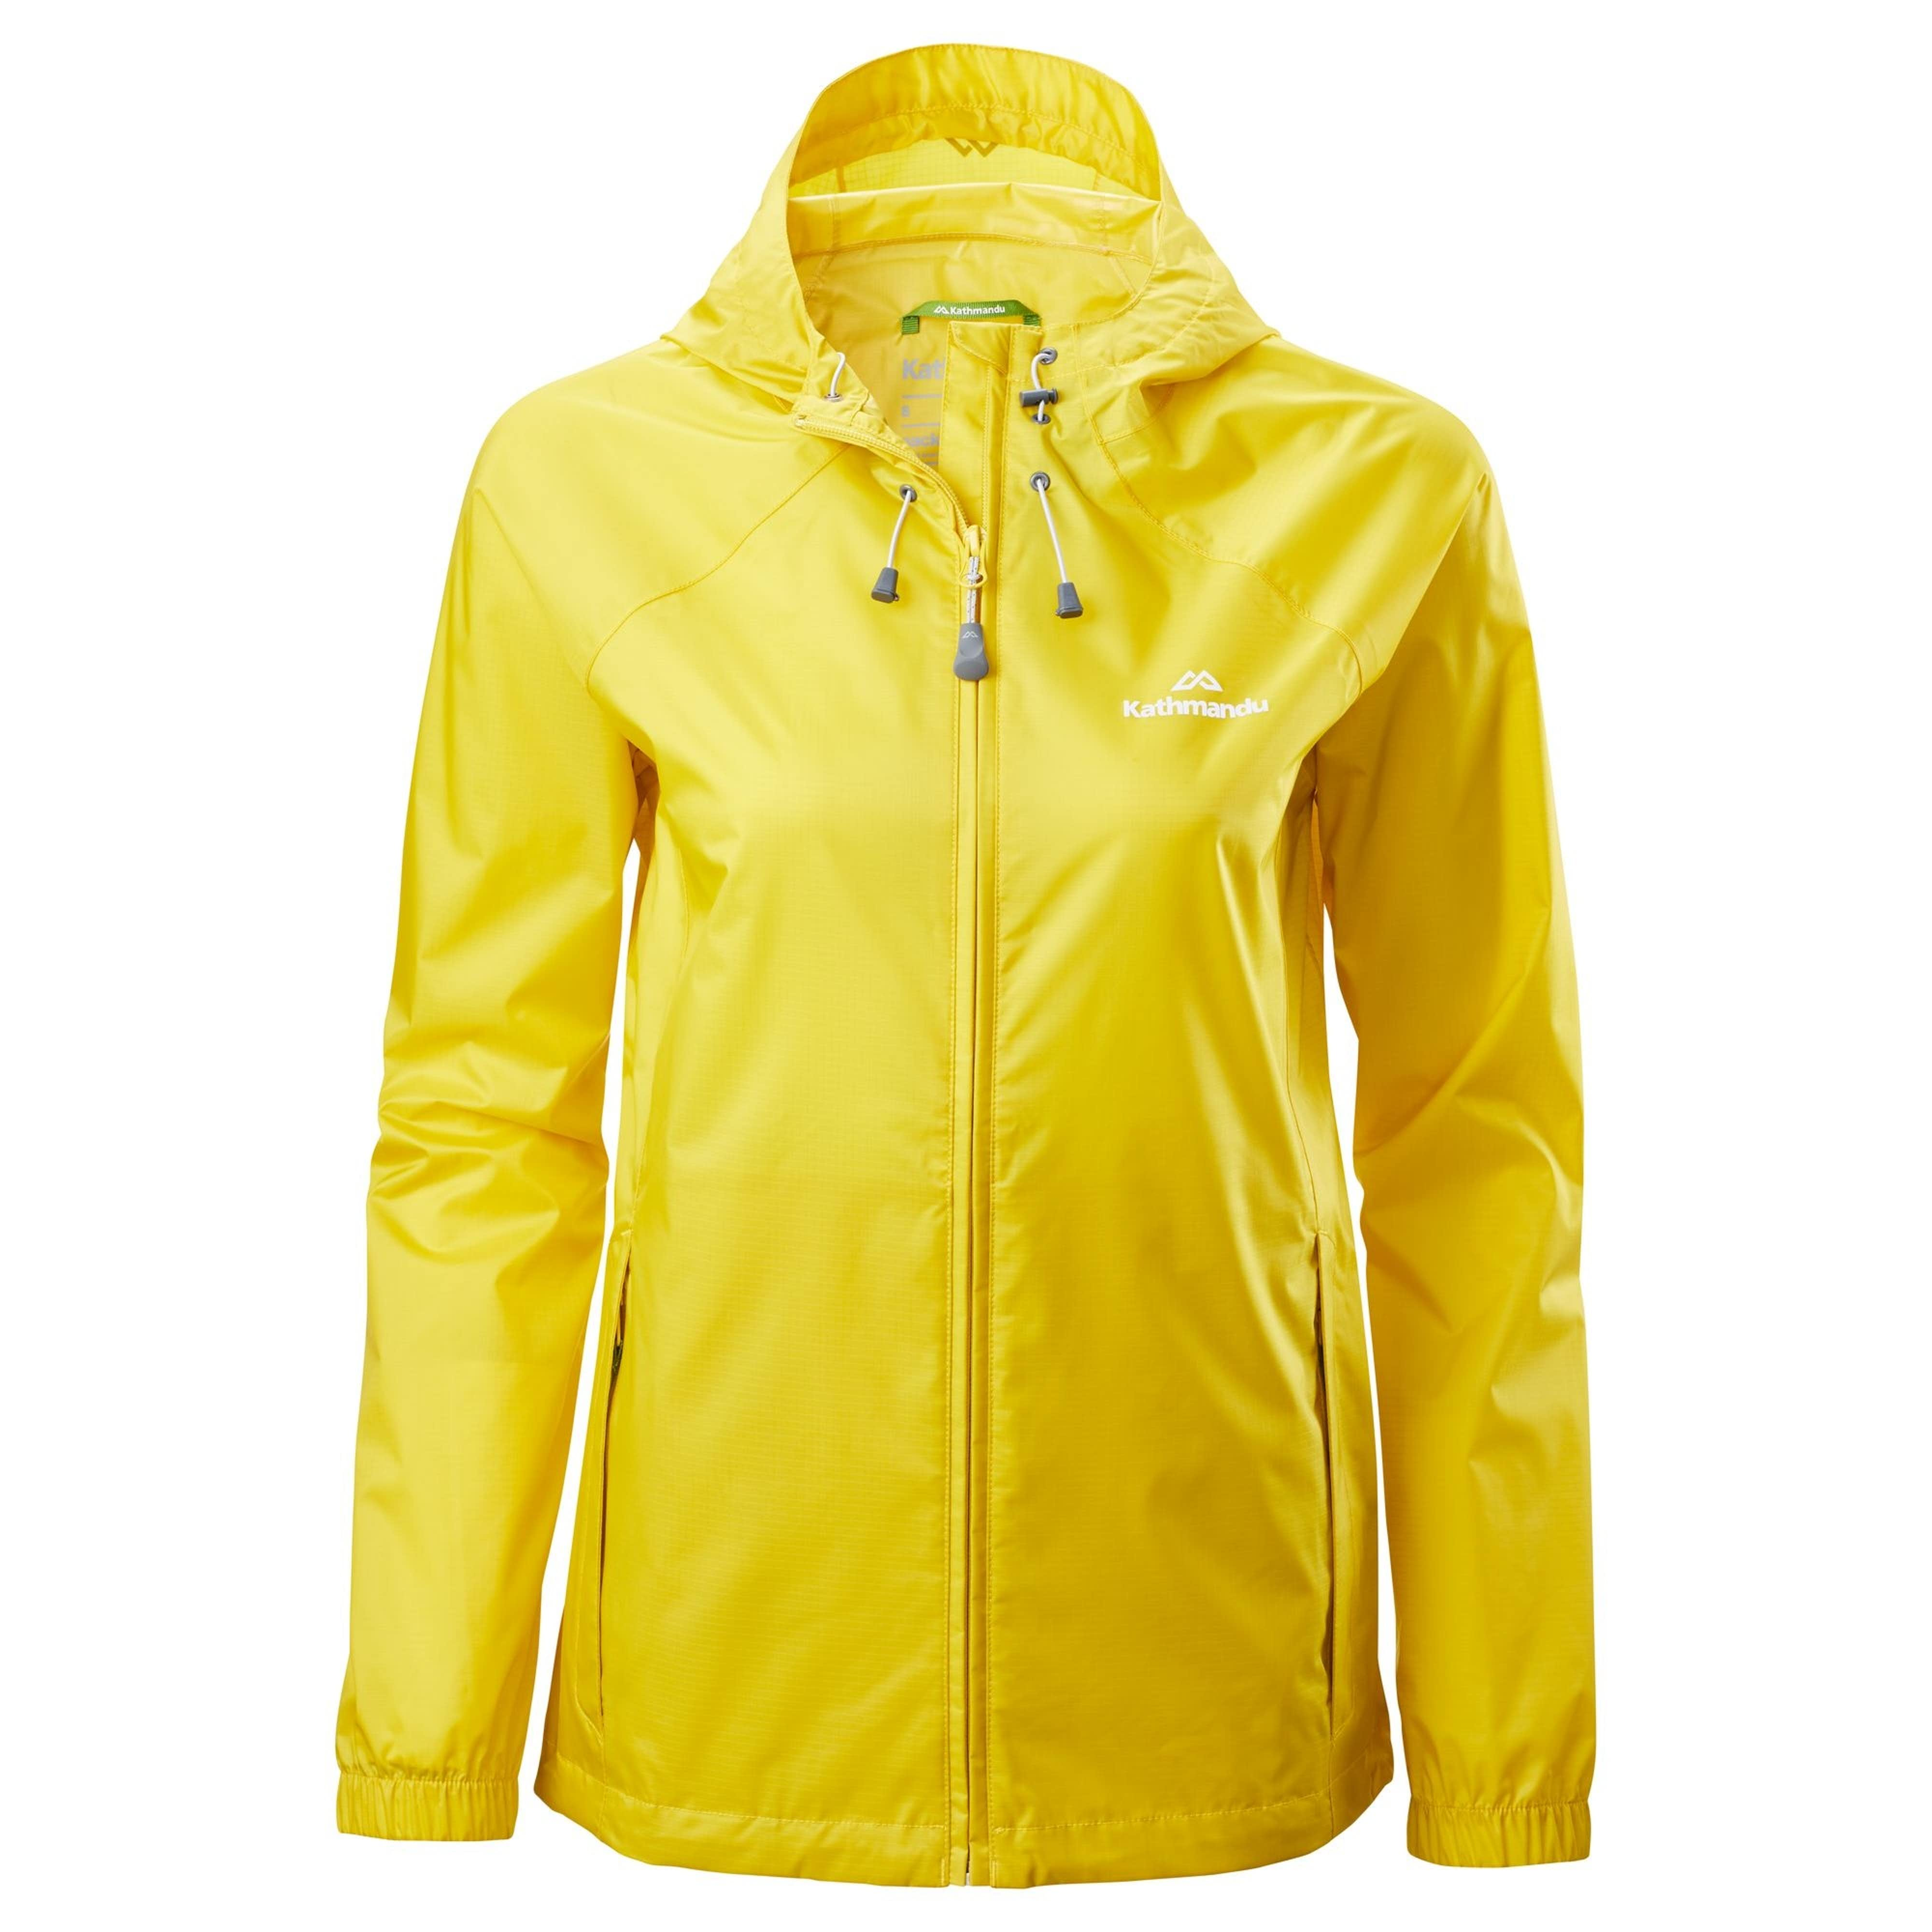 cb21c8c85 Pocket-it Women's Rain Jacket